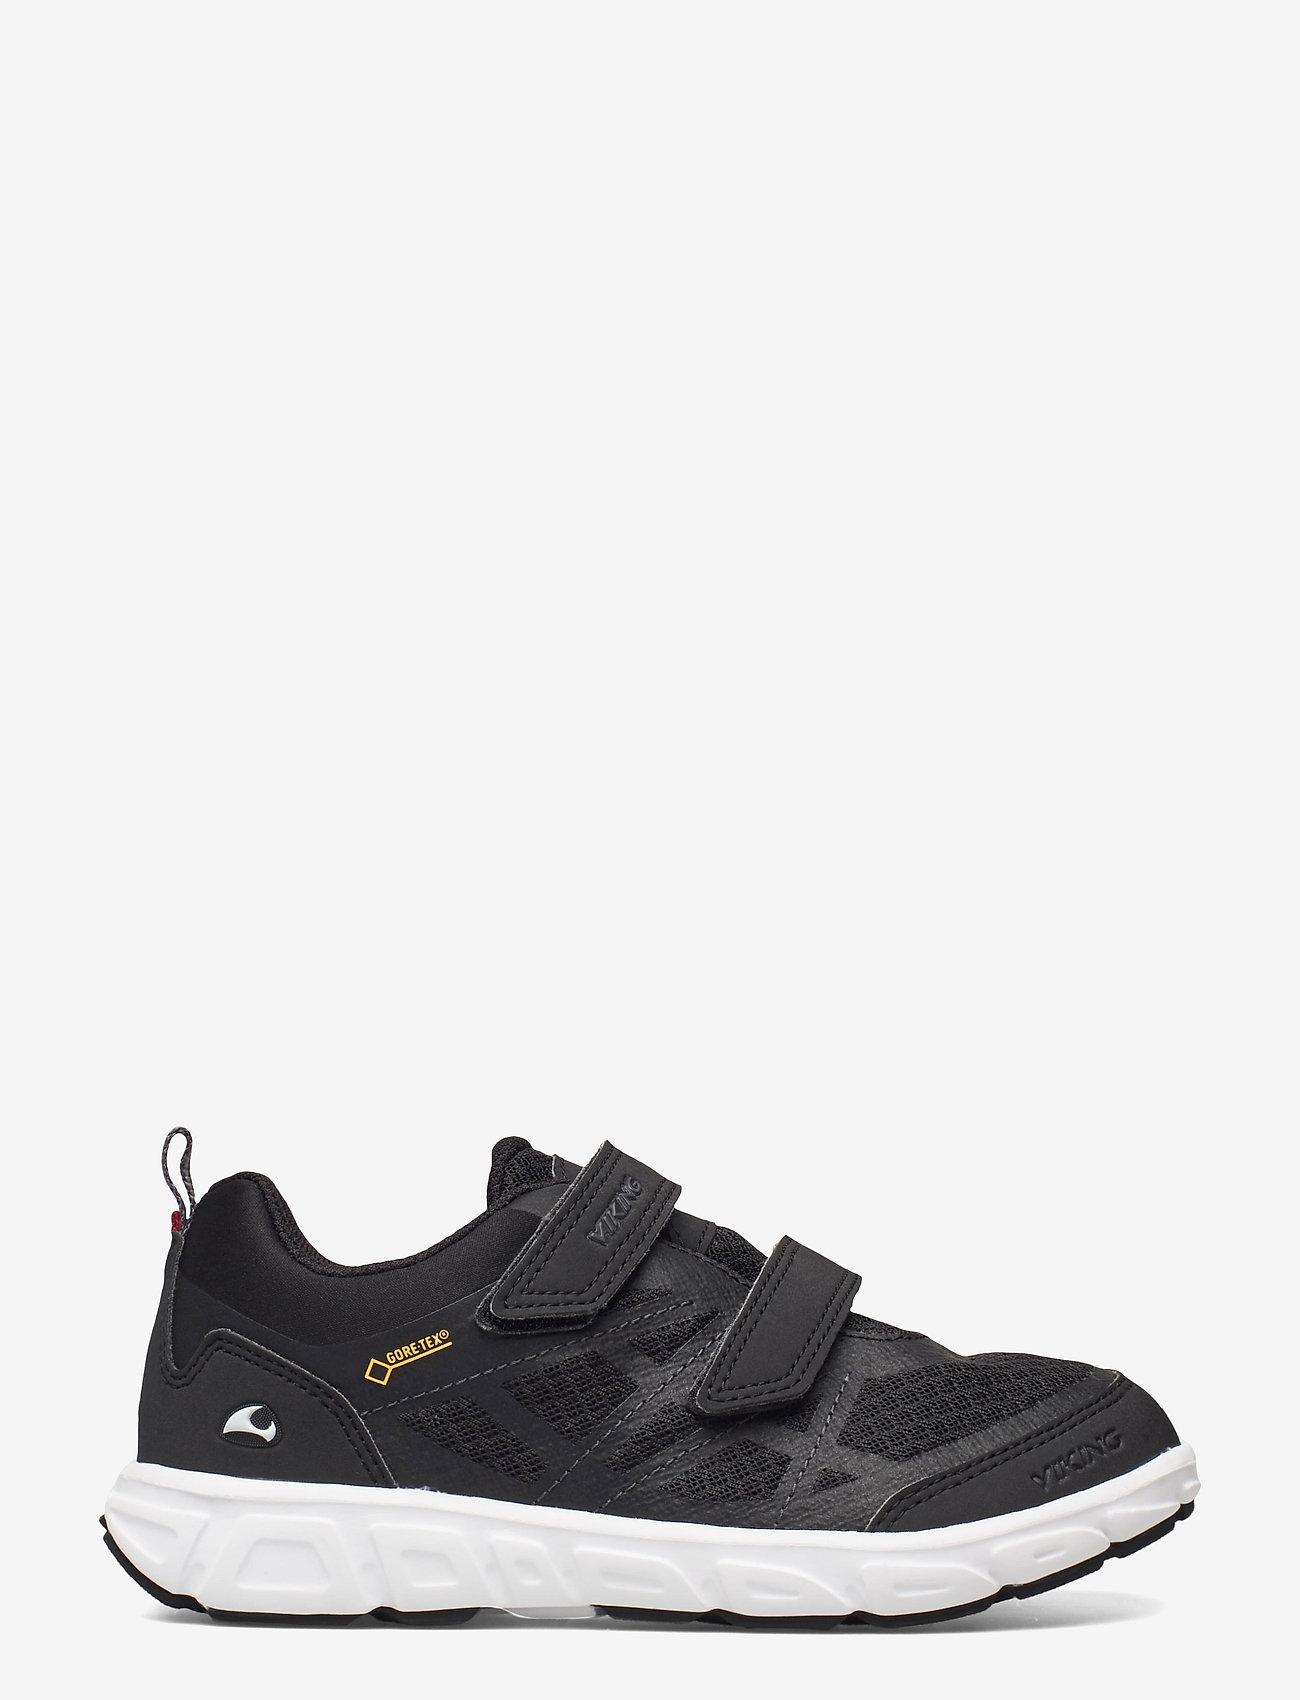 Viking - Veme Vel GTX - low tops - black/charcoal - 1